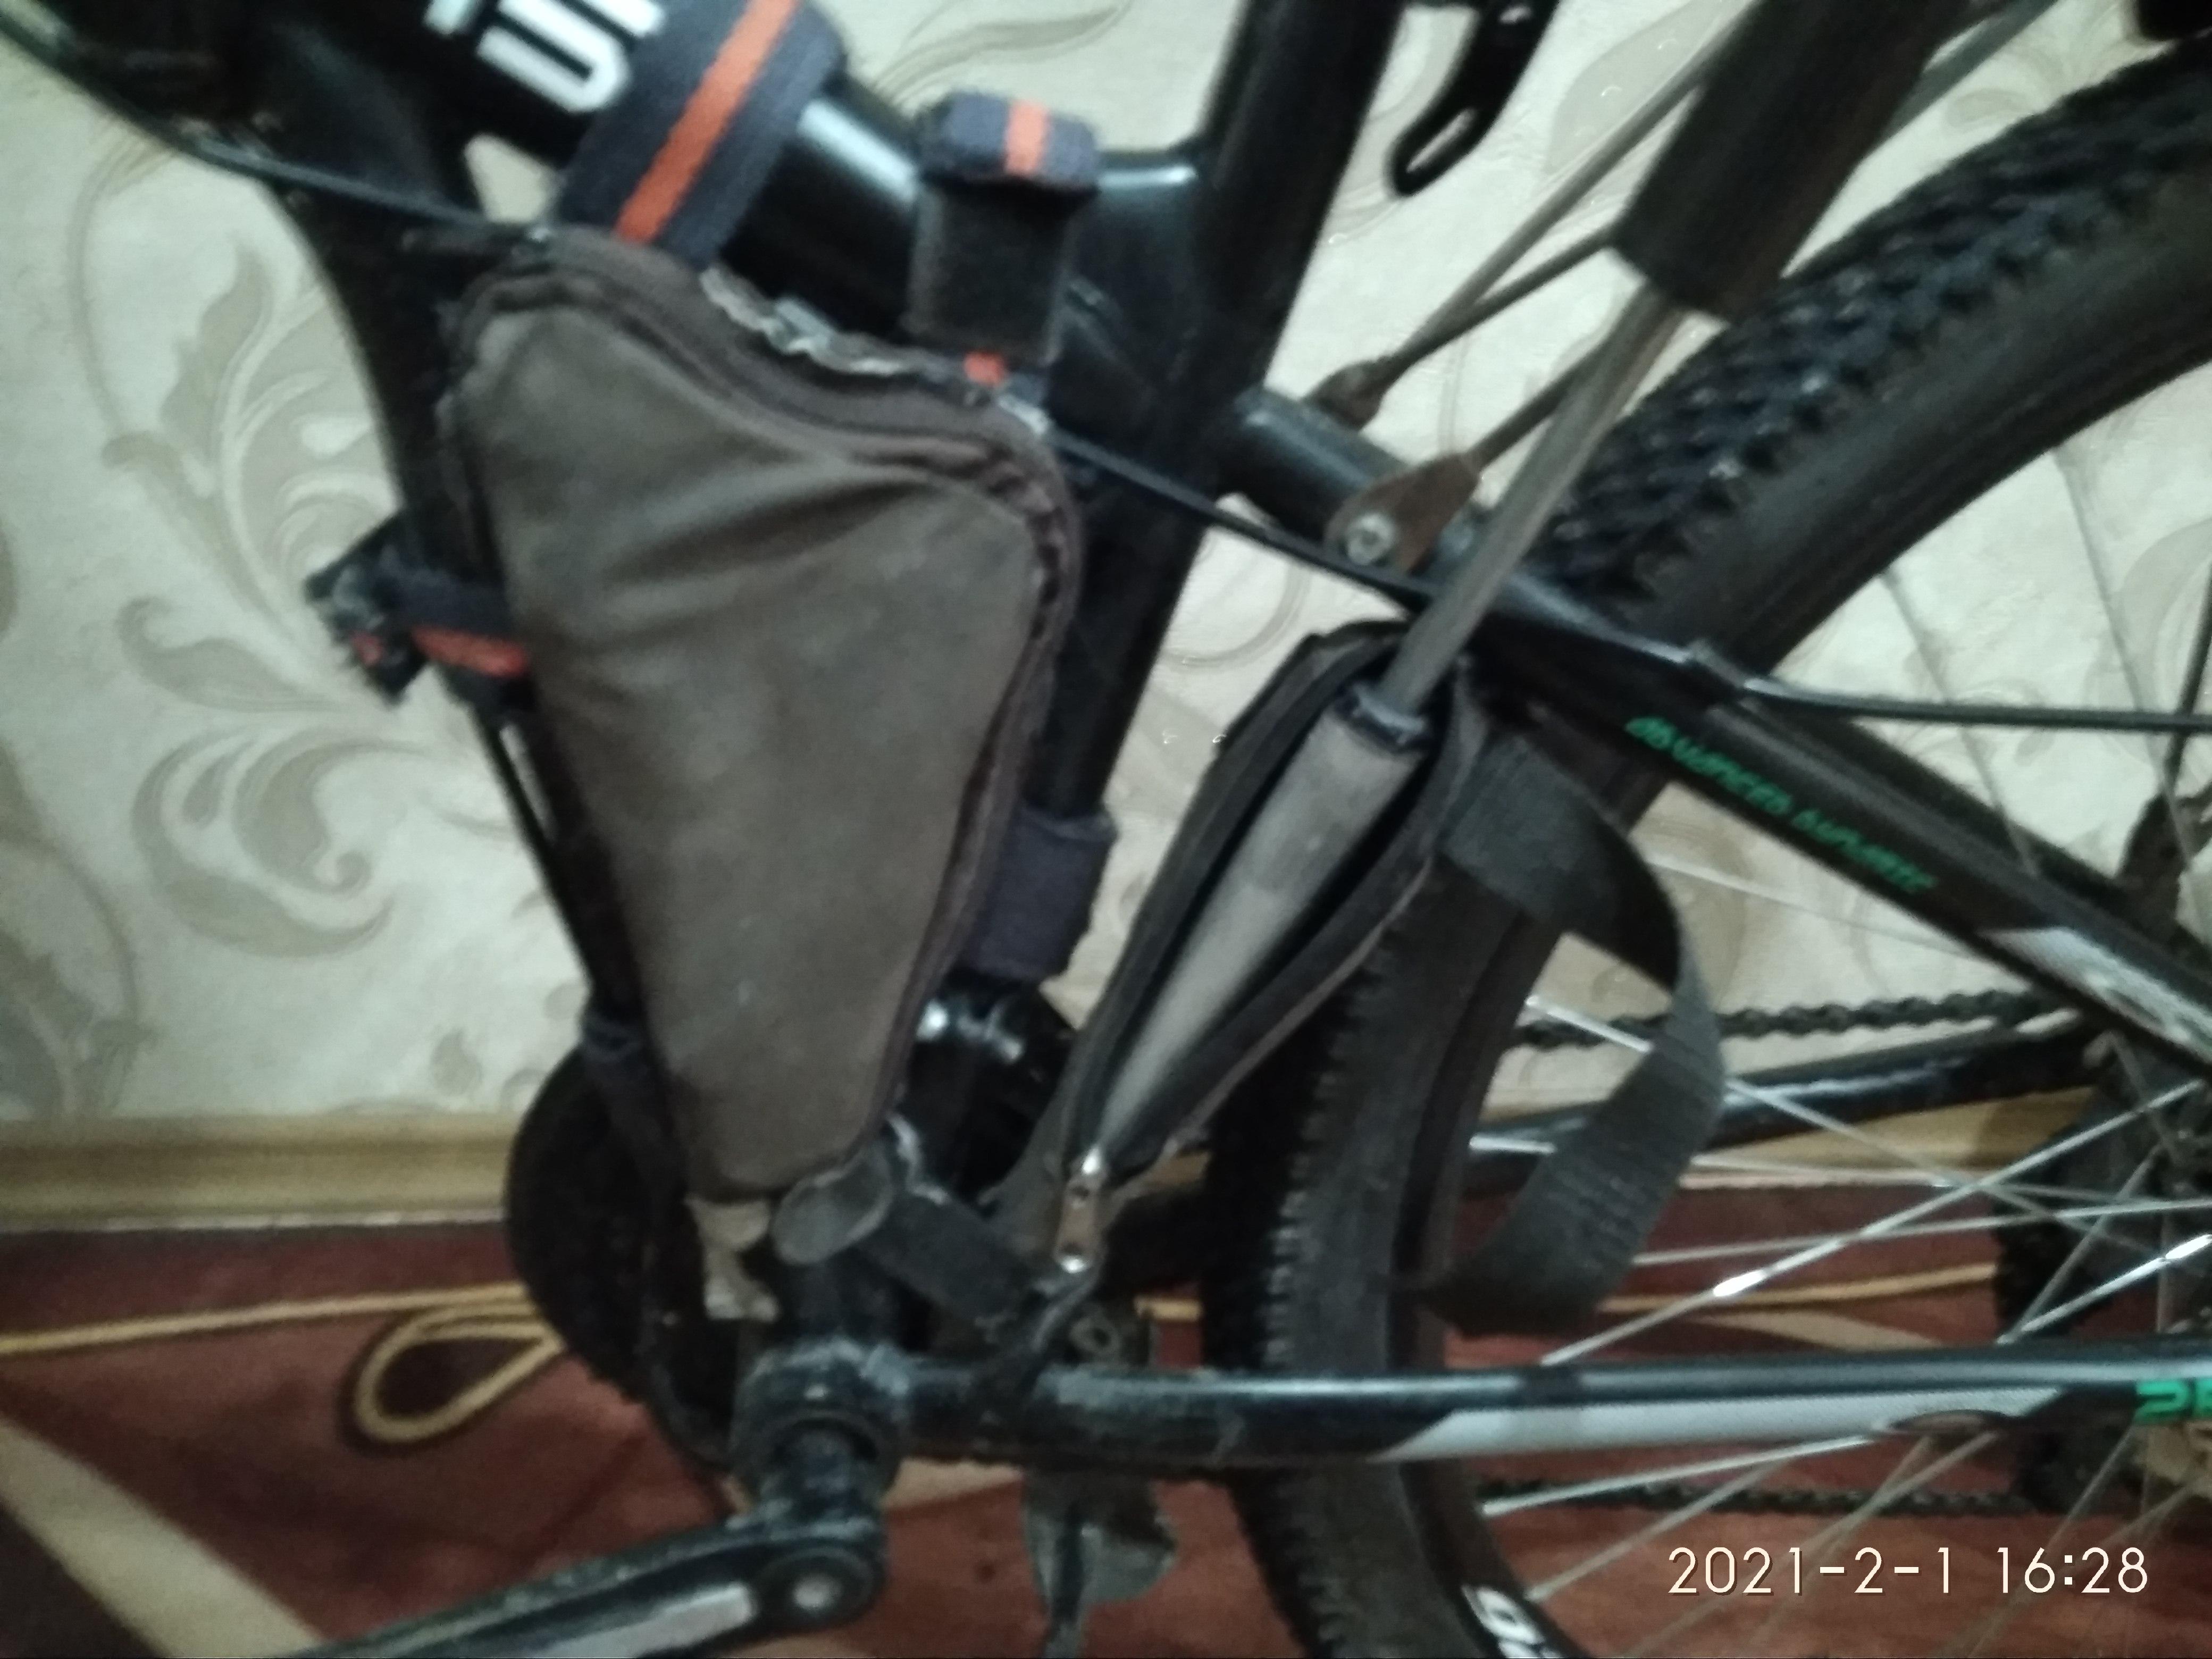 Сумка и насос велосипеда